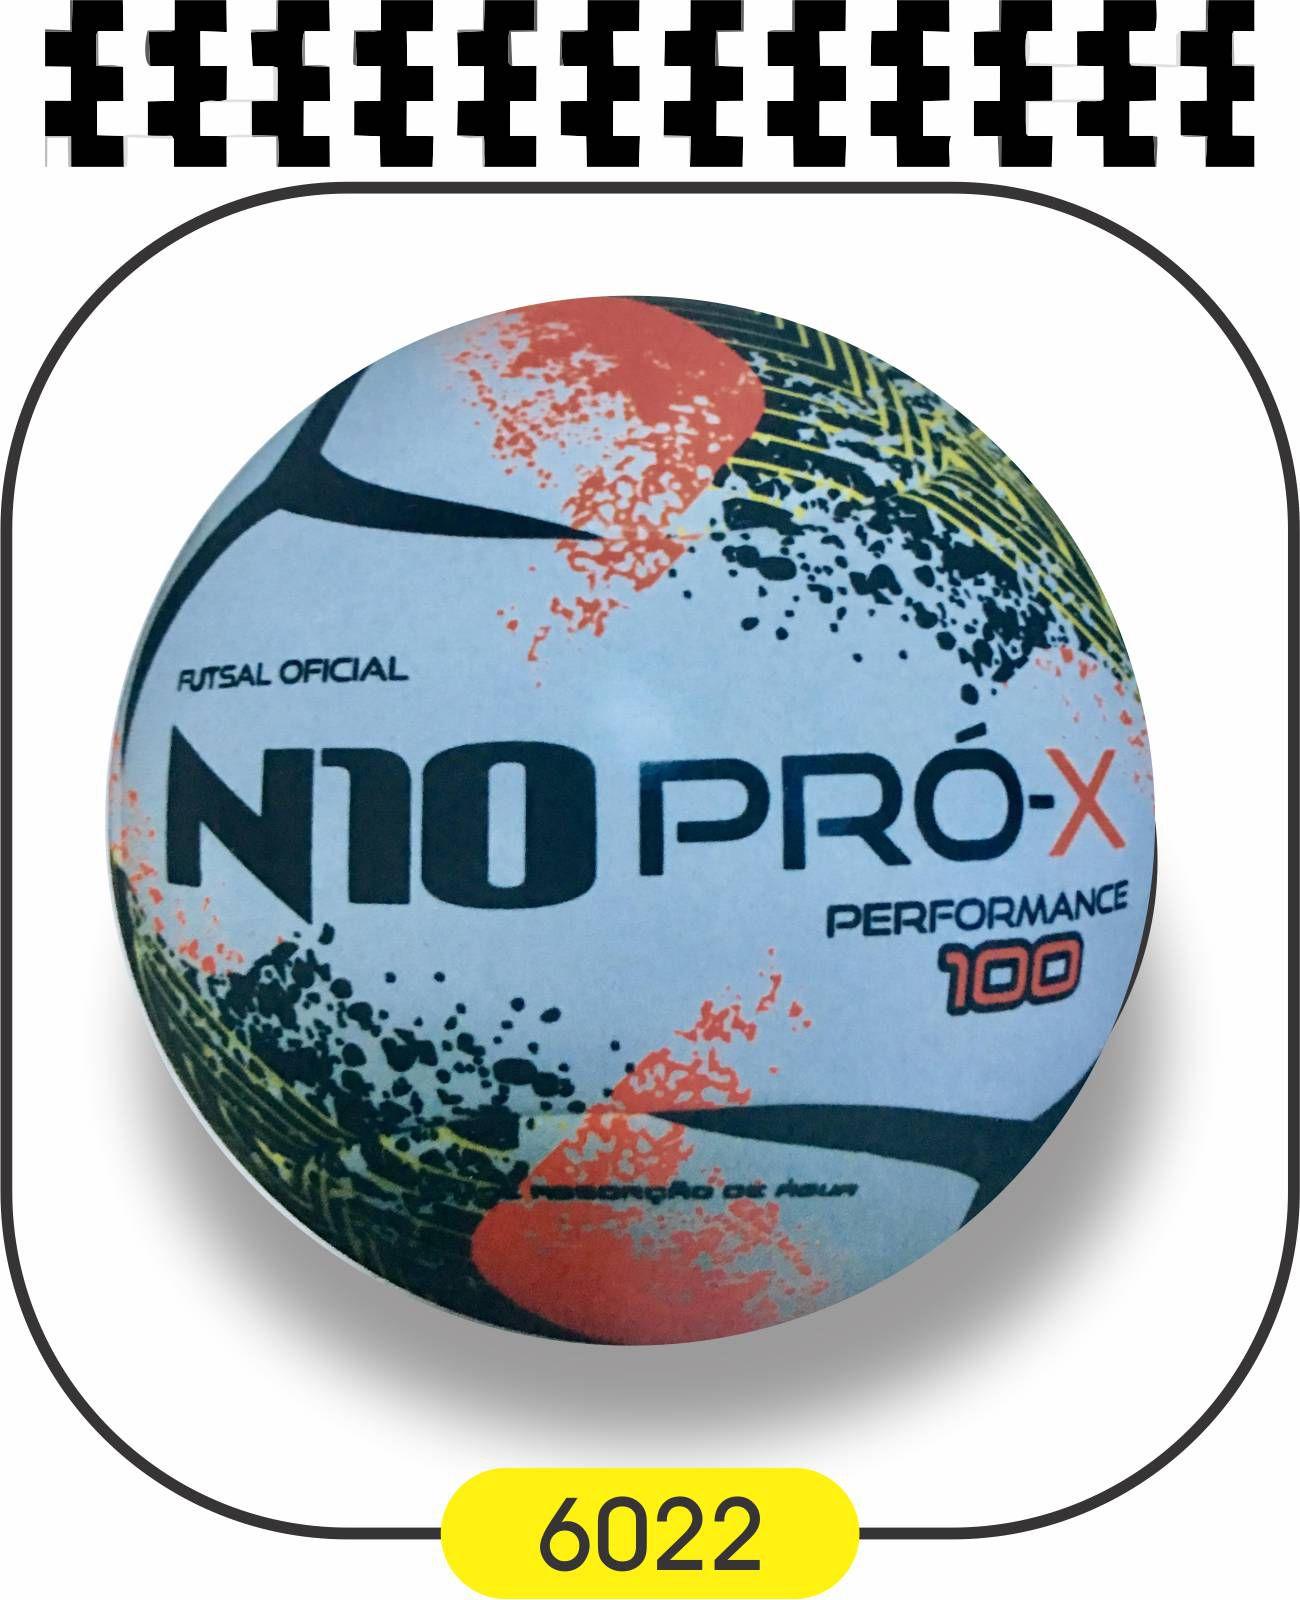 Bola de Futsal N10 PRO-X PERFORMANCE 100 - TERMOFUSY  - Bolas Lassabia - Bolas e Brindes Personalizados